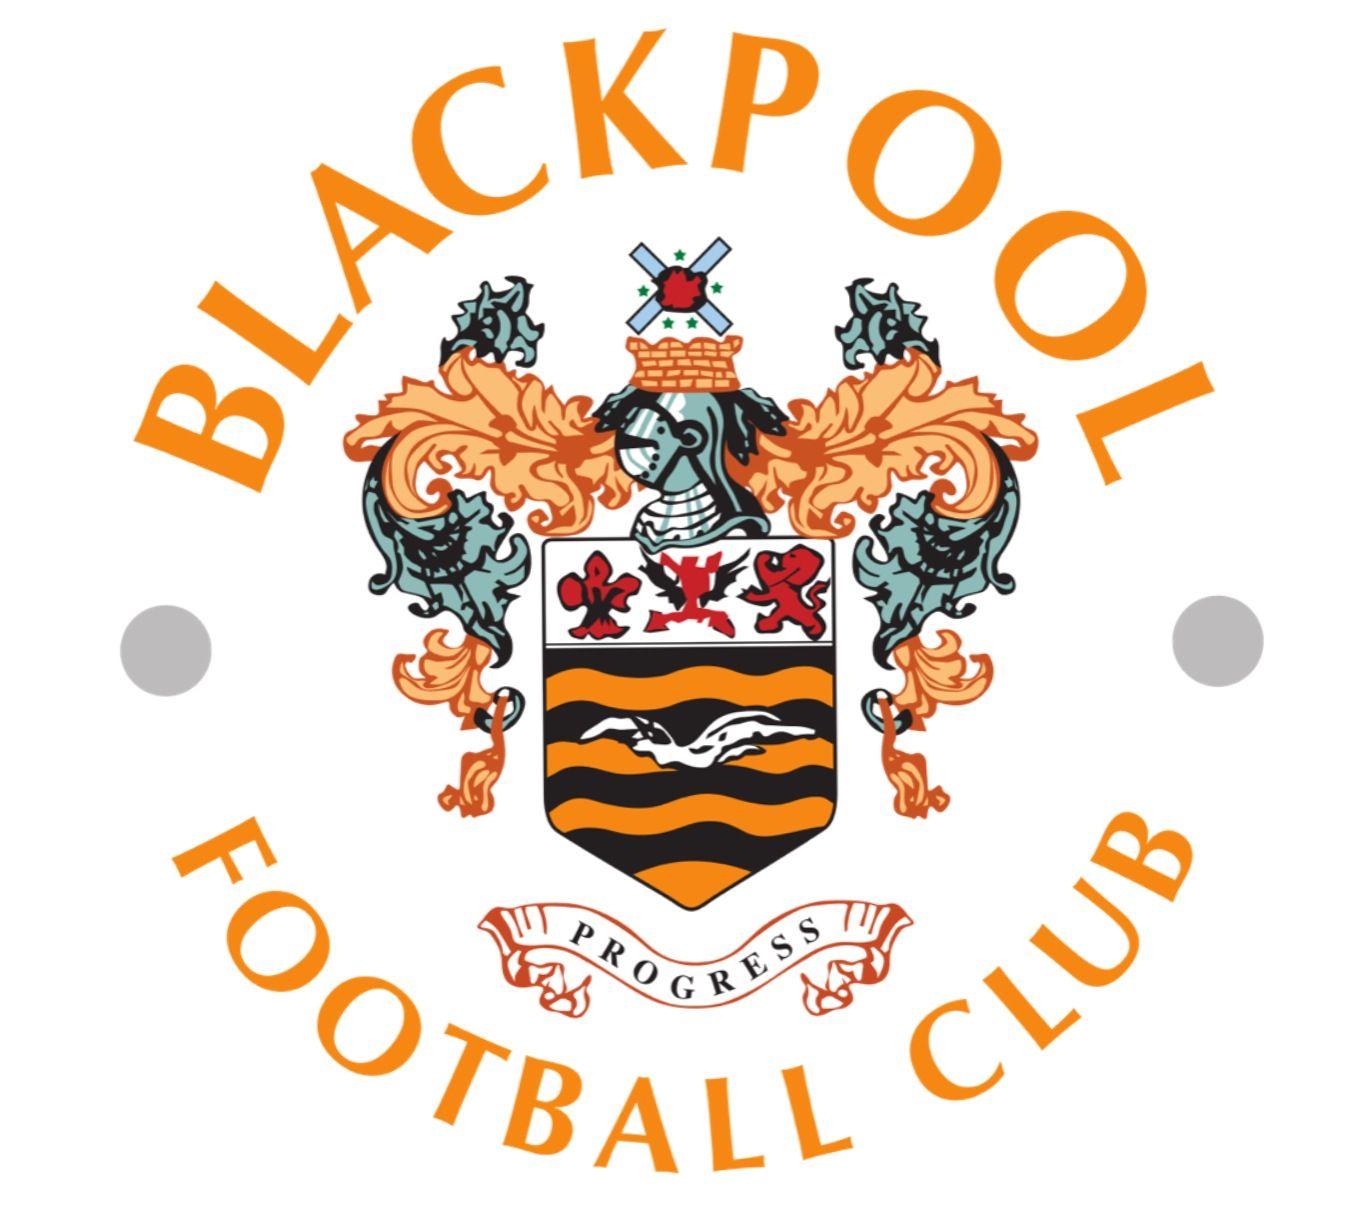 Blackpool Football Club 2005Present Equipo de fútbol